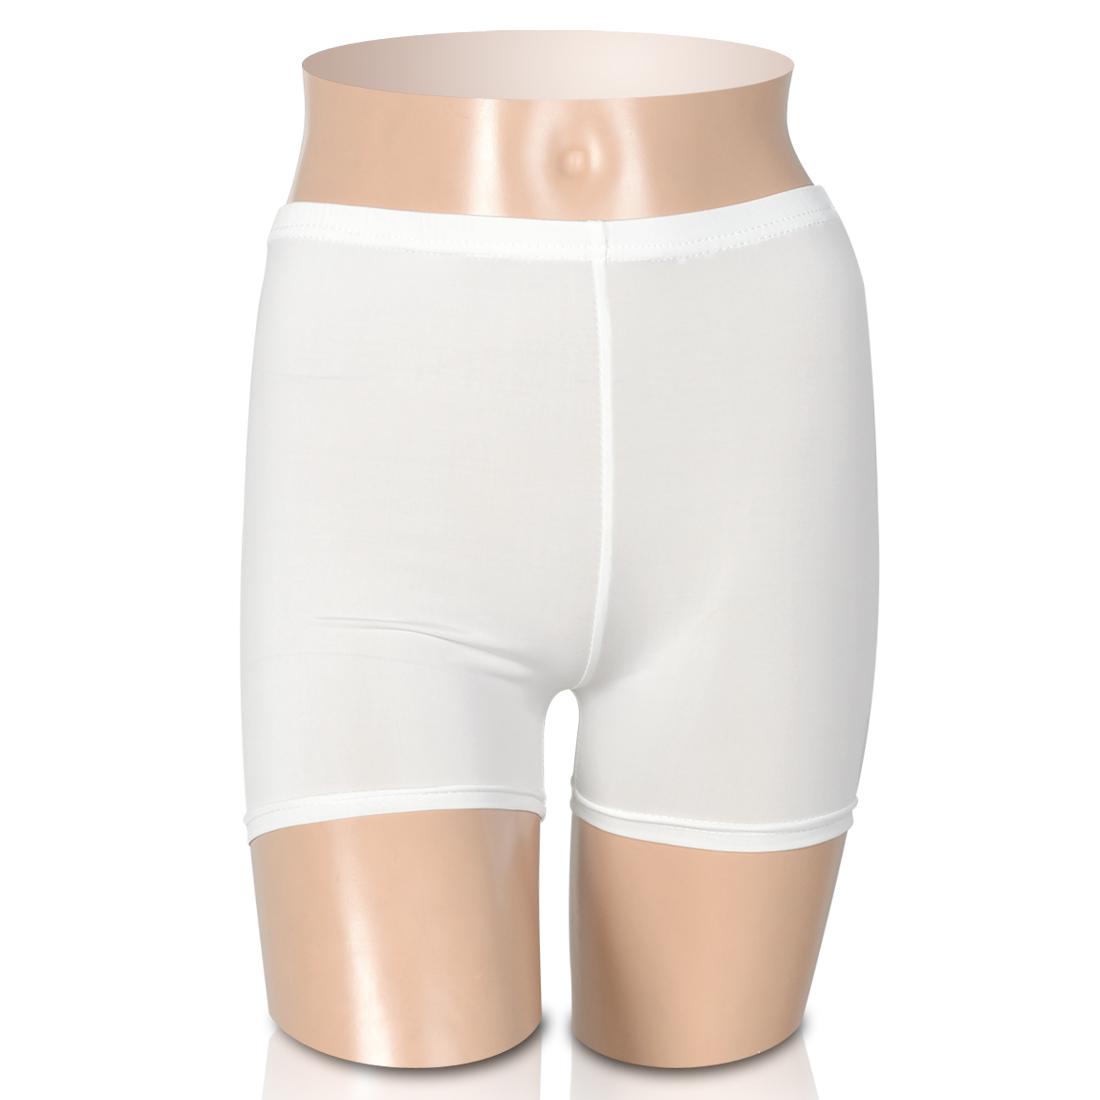 Women Elastic Waist Dance Shorts Safety Pants Leggings White XS